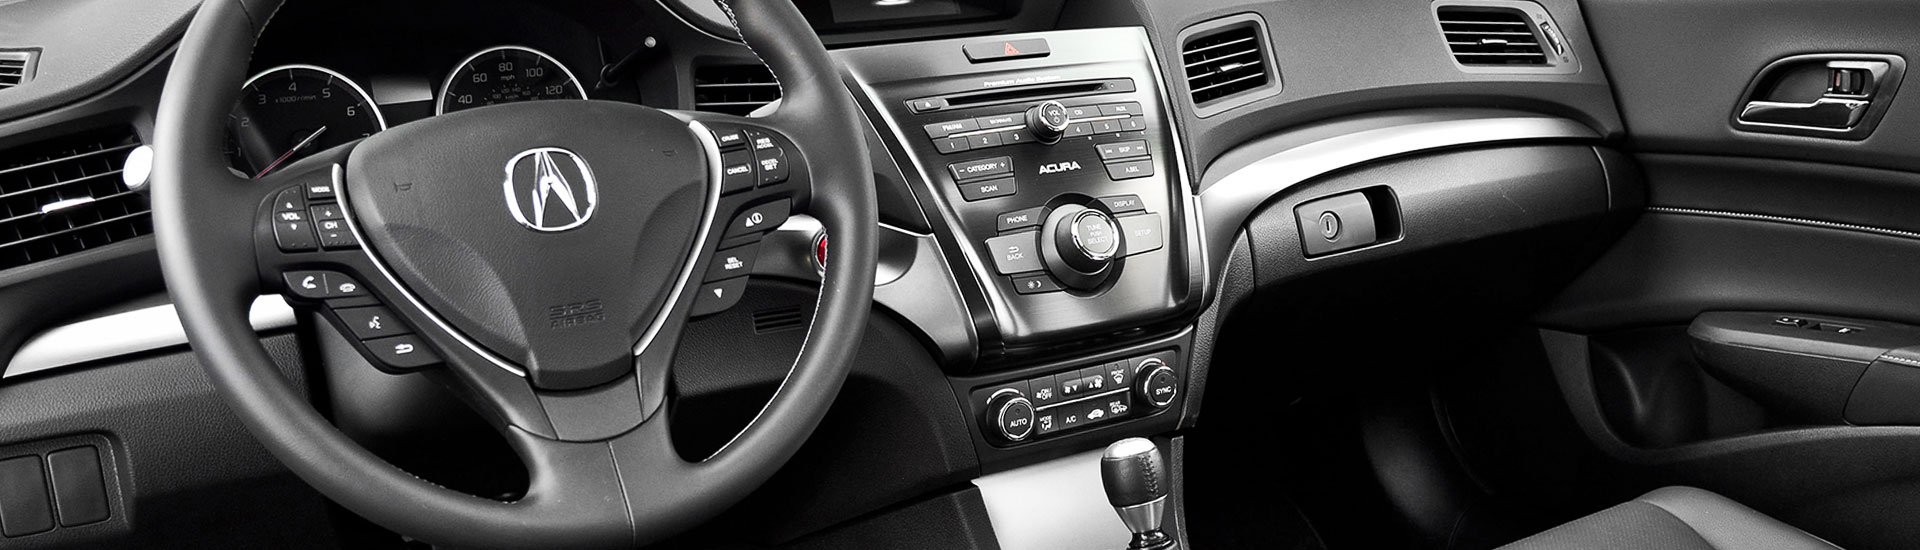 Acura ILX Dash Kits | Custom Acura ILX Dash Kit